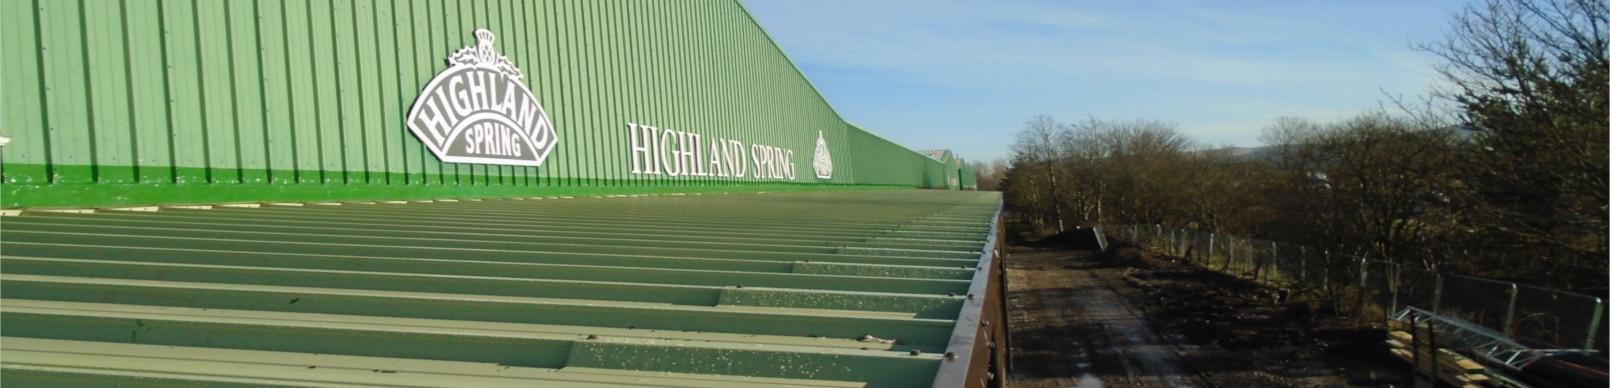 Highland Spring cladding